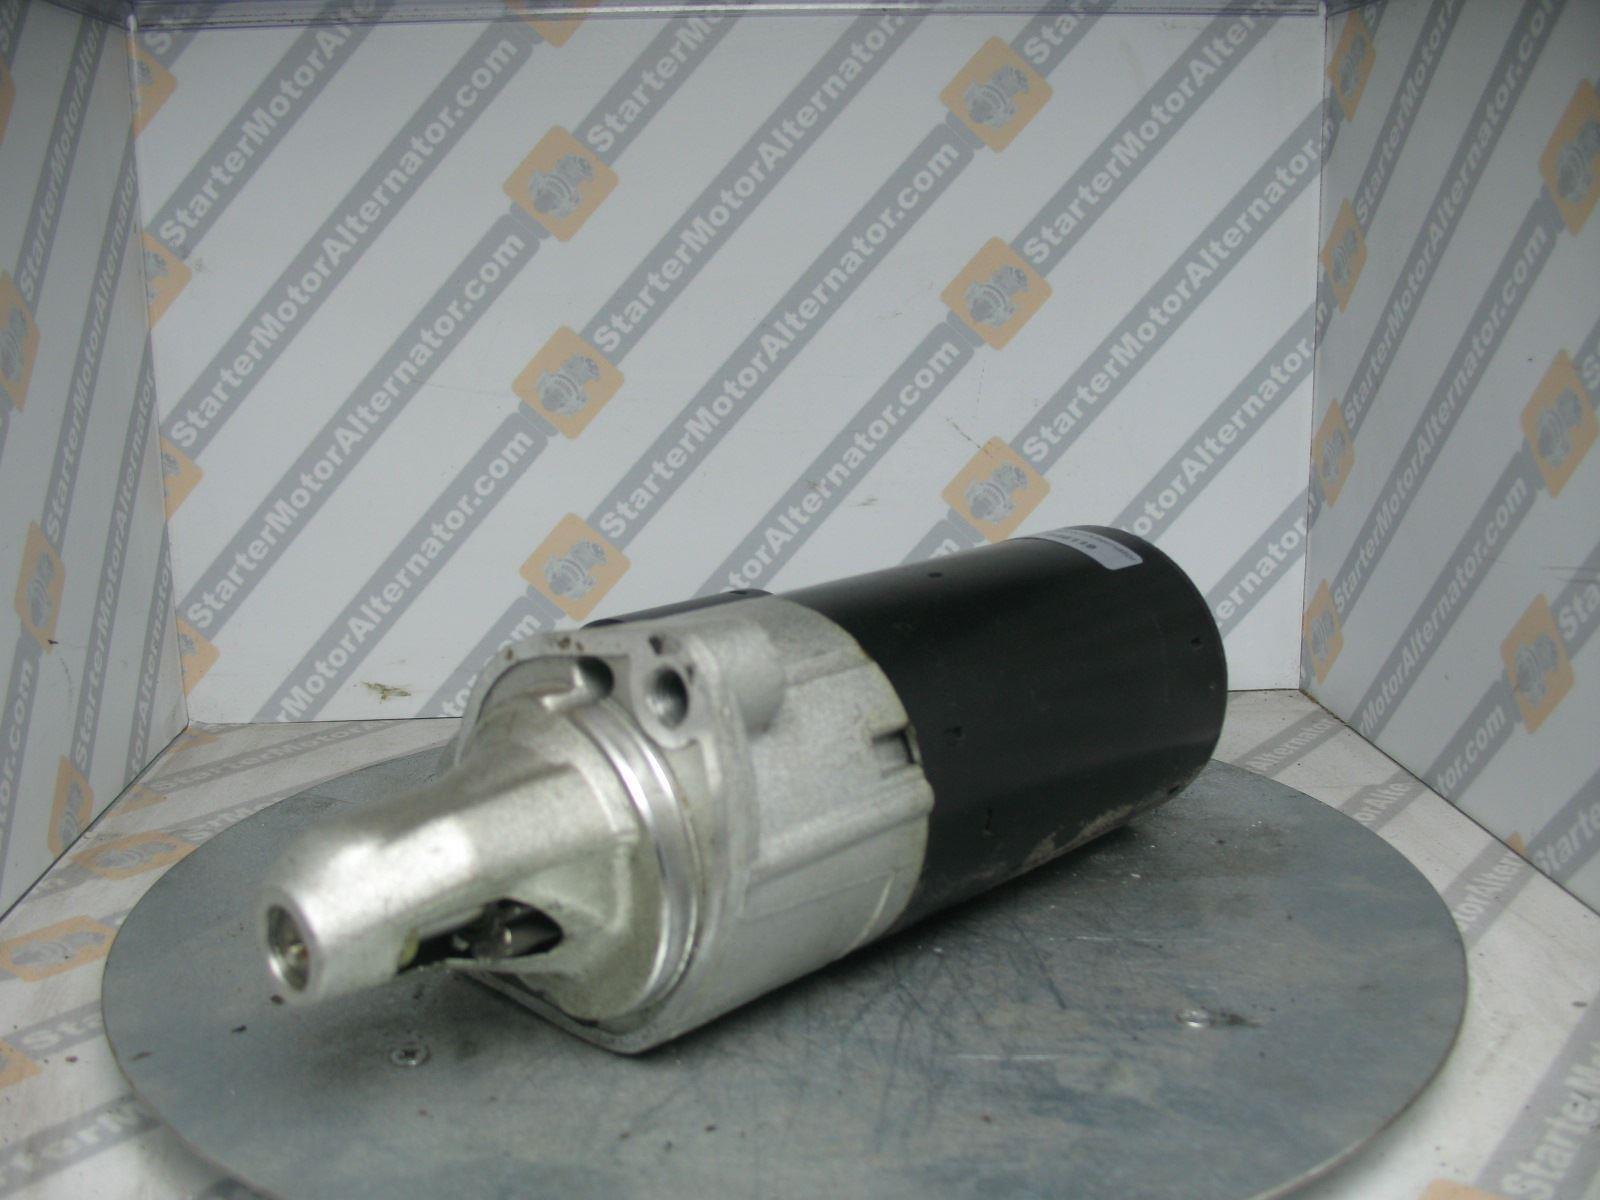 XIU1072 Starter Motor For Chrysler / Maybach / Mercedes Benz